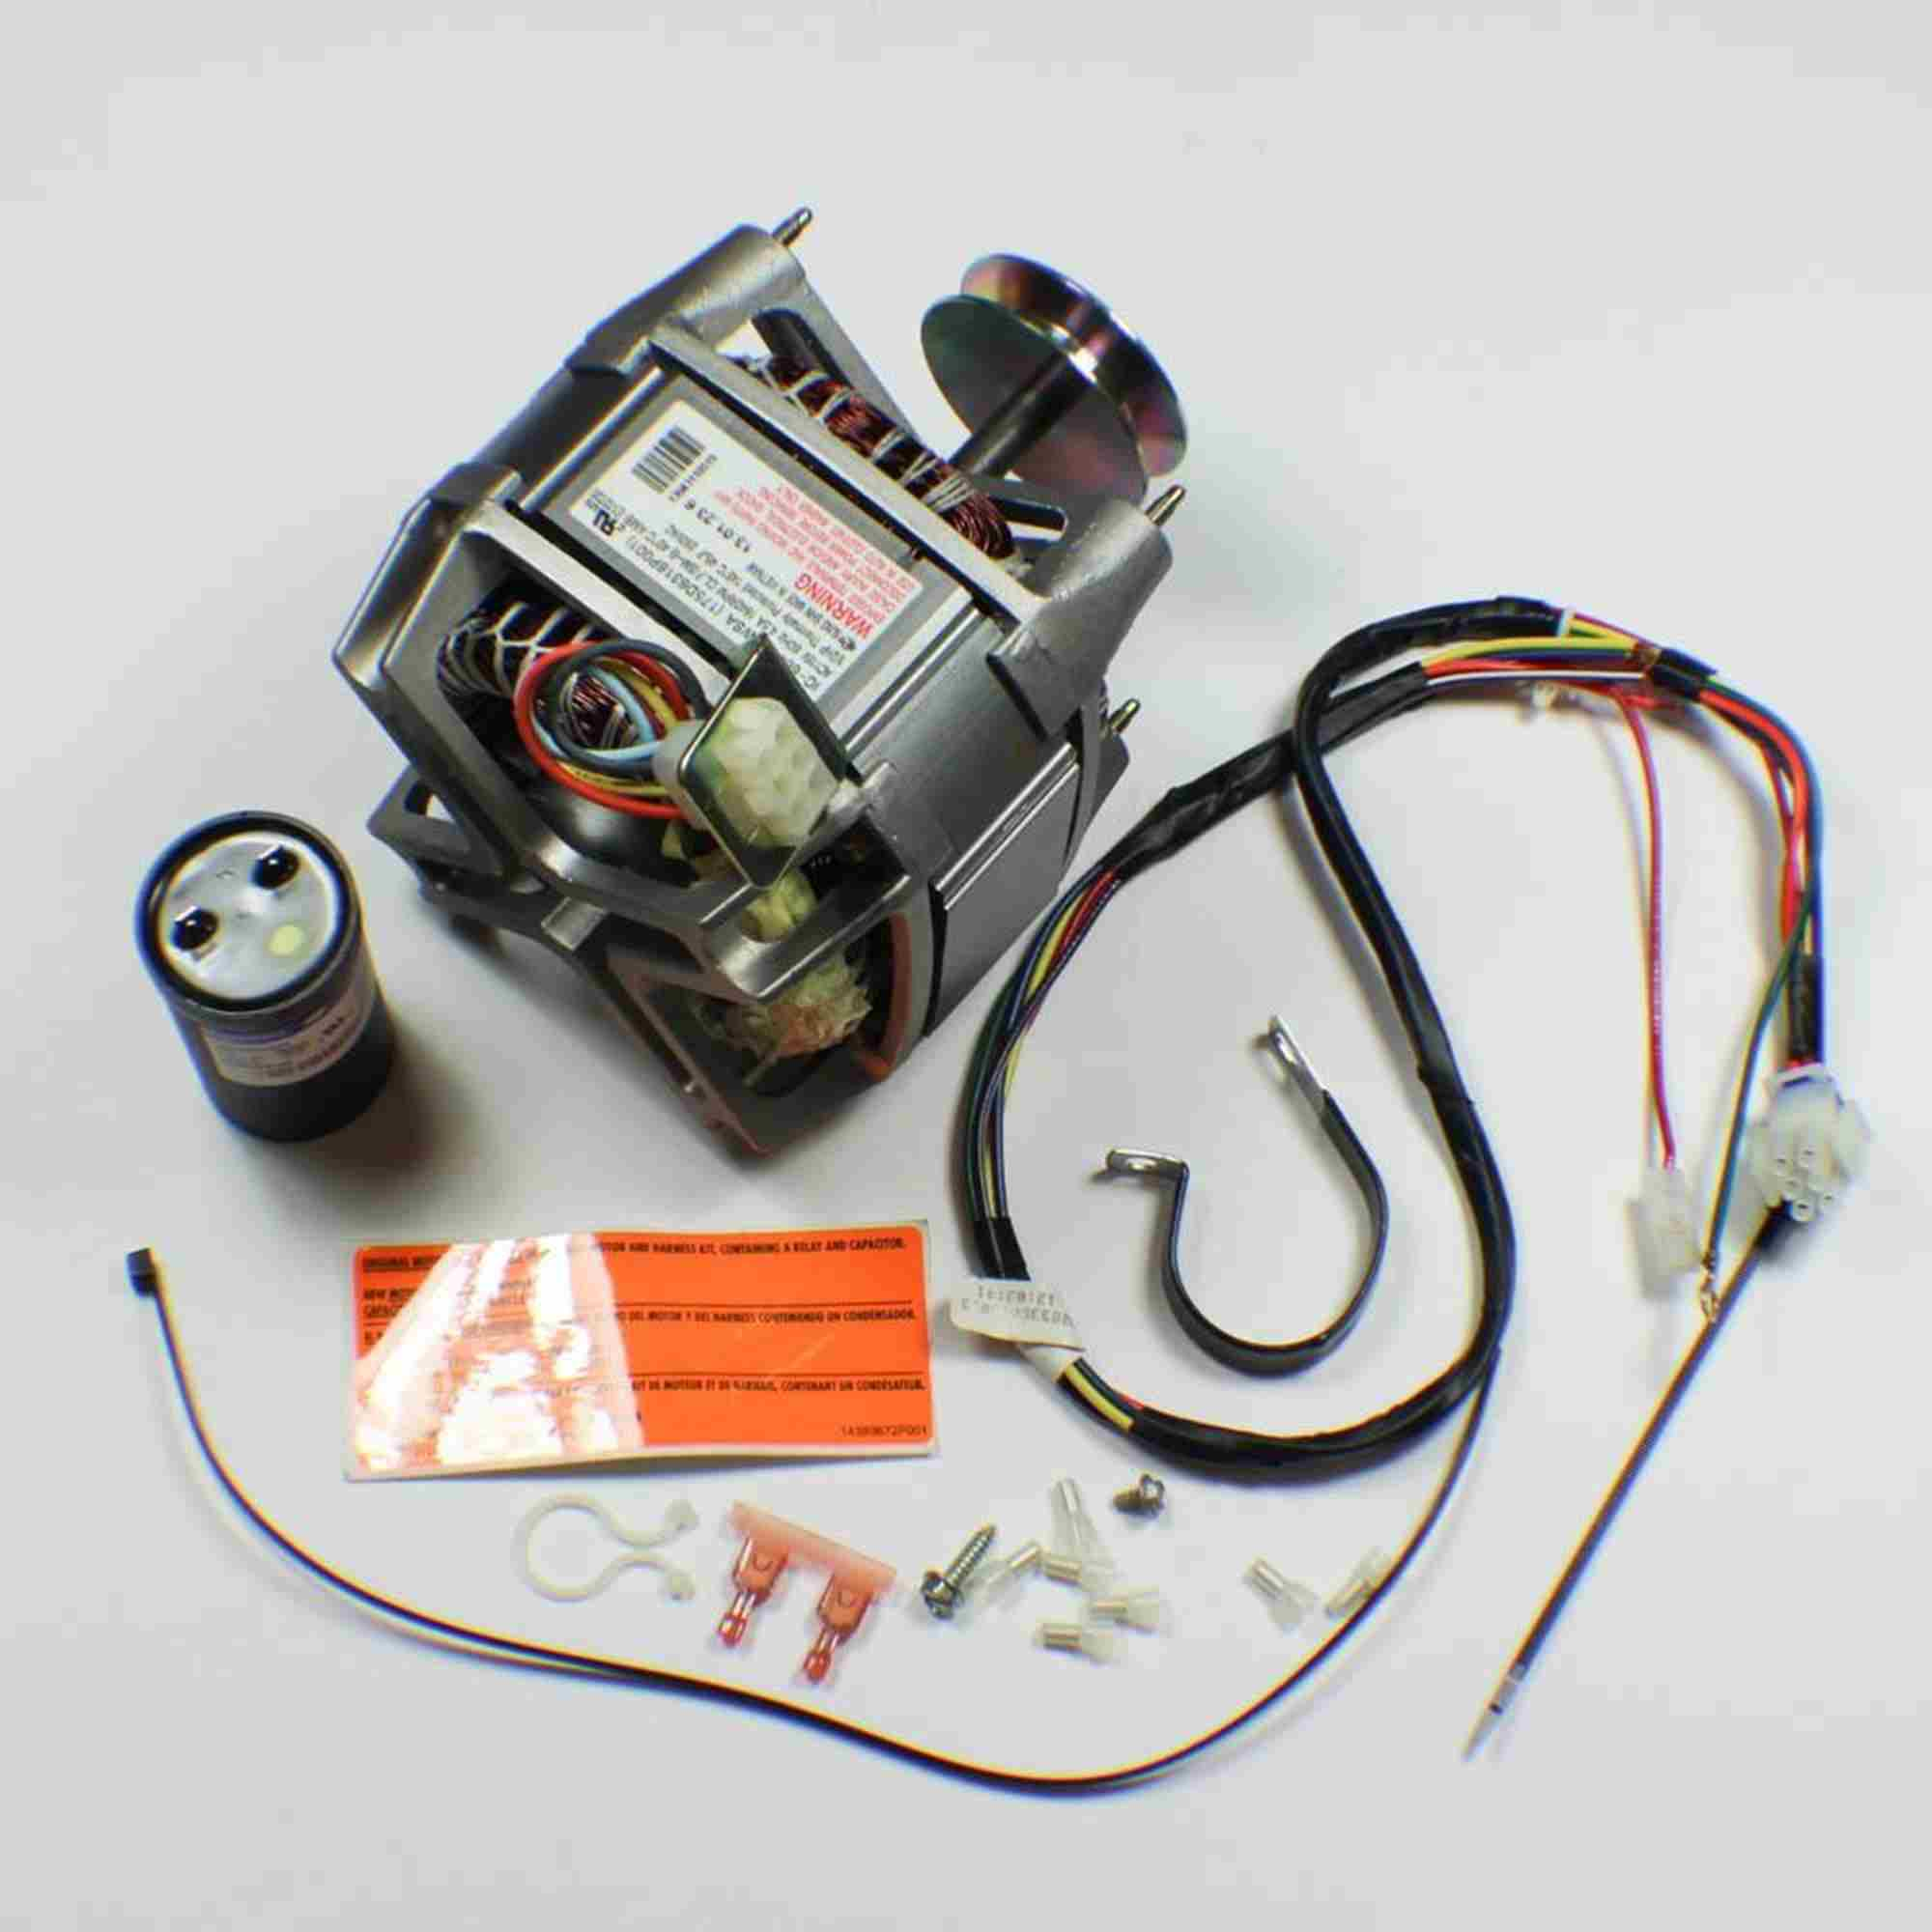 WH49X10029 Genuine OEM For GE Kit- 1 Spd Washer Motor